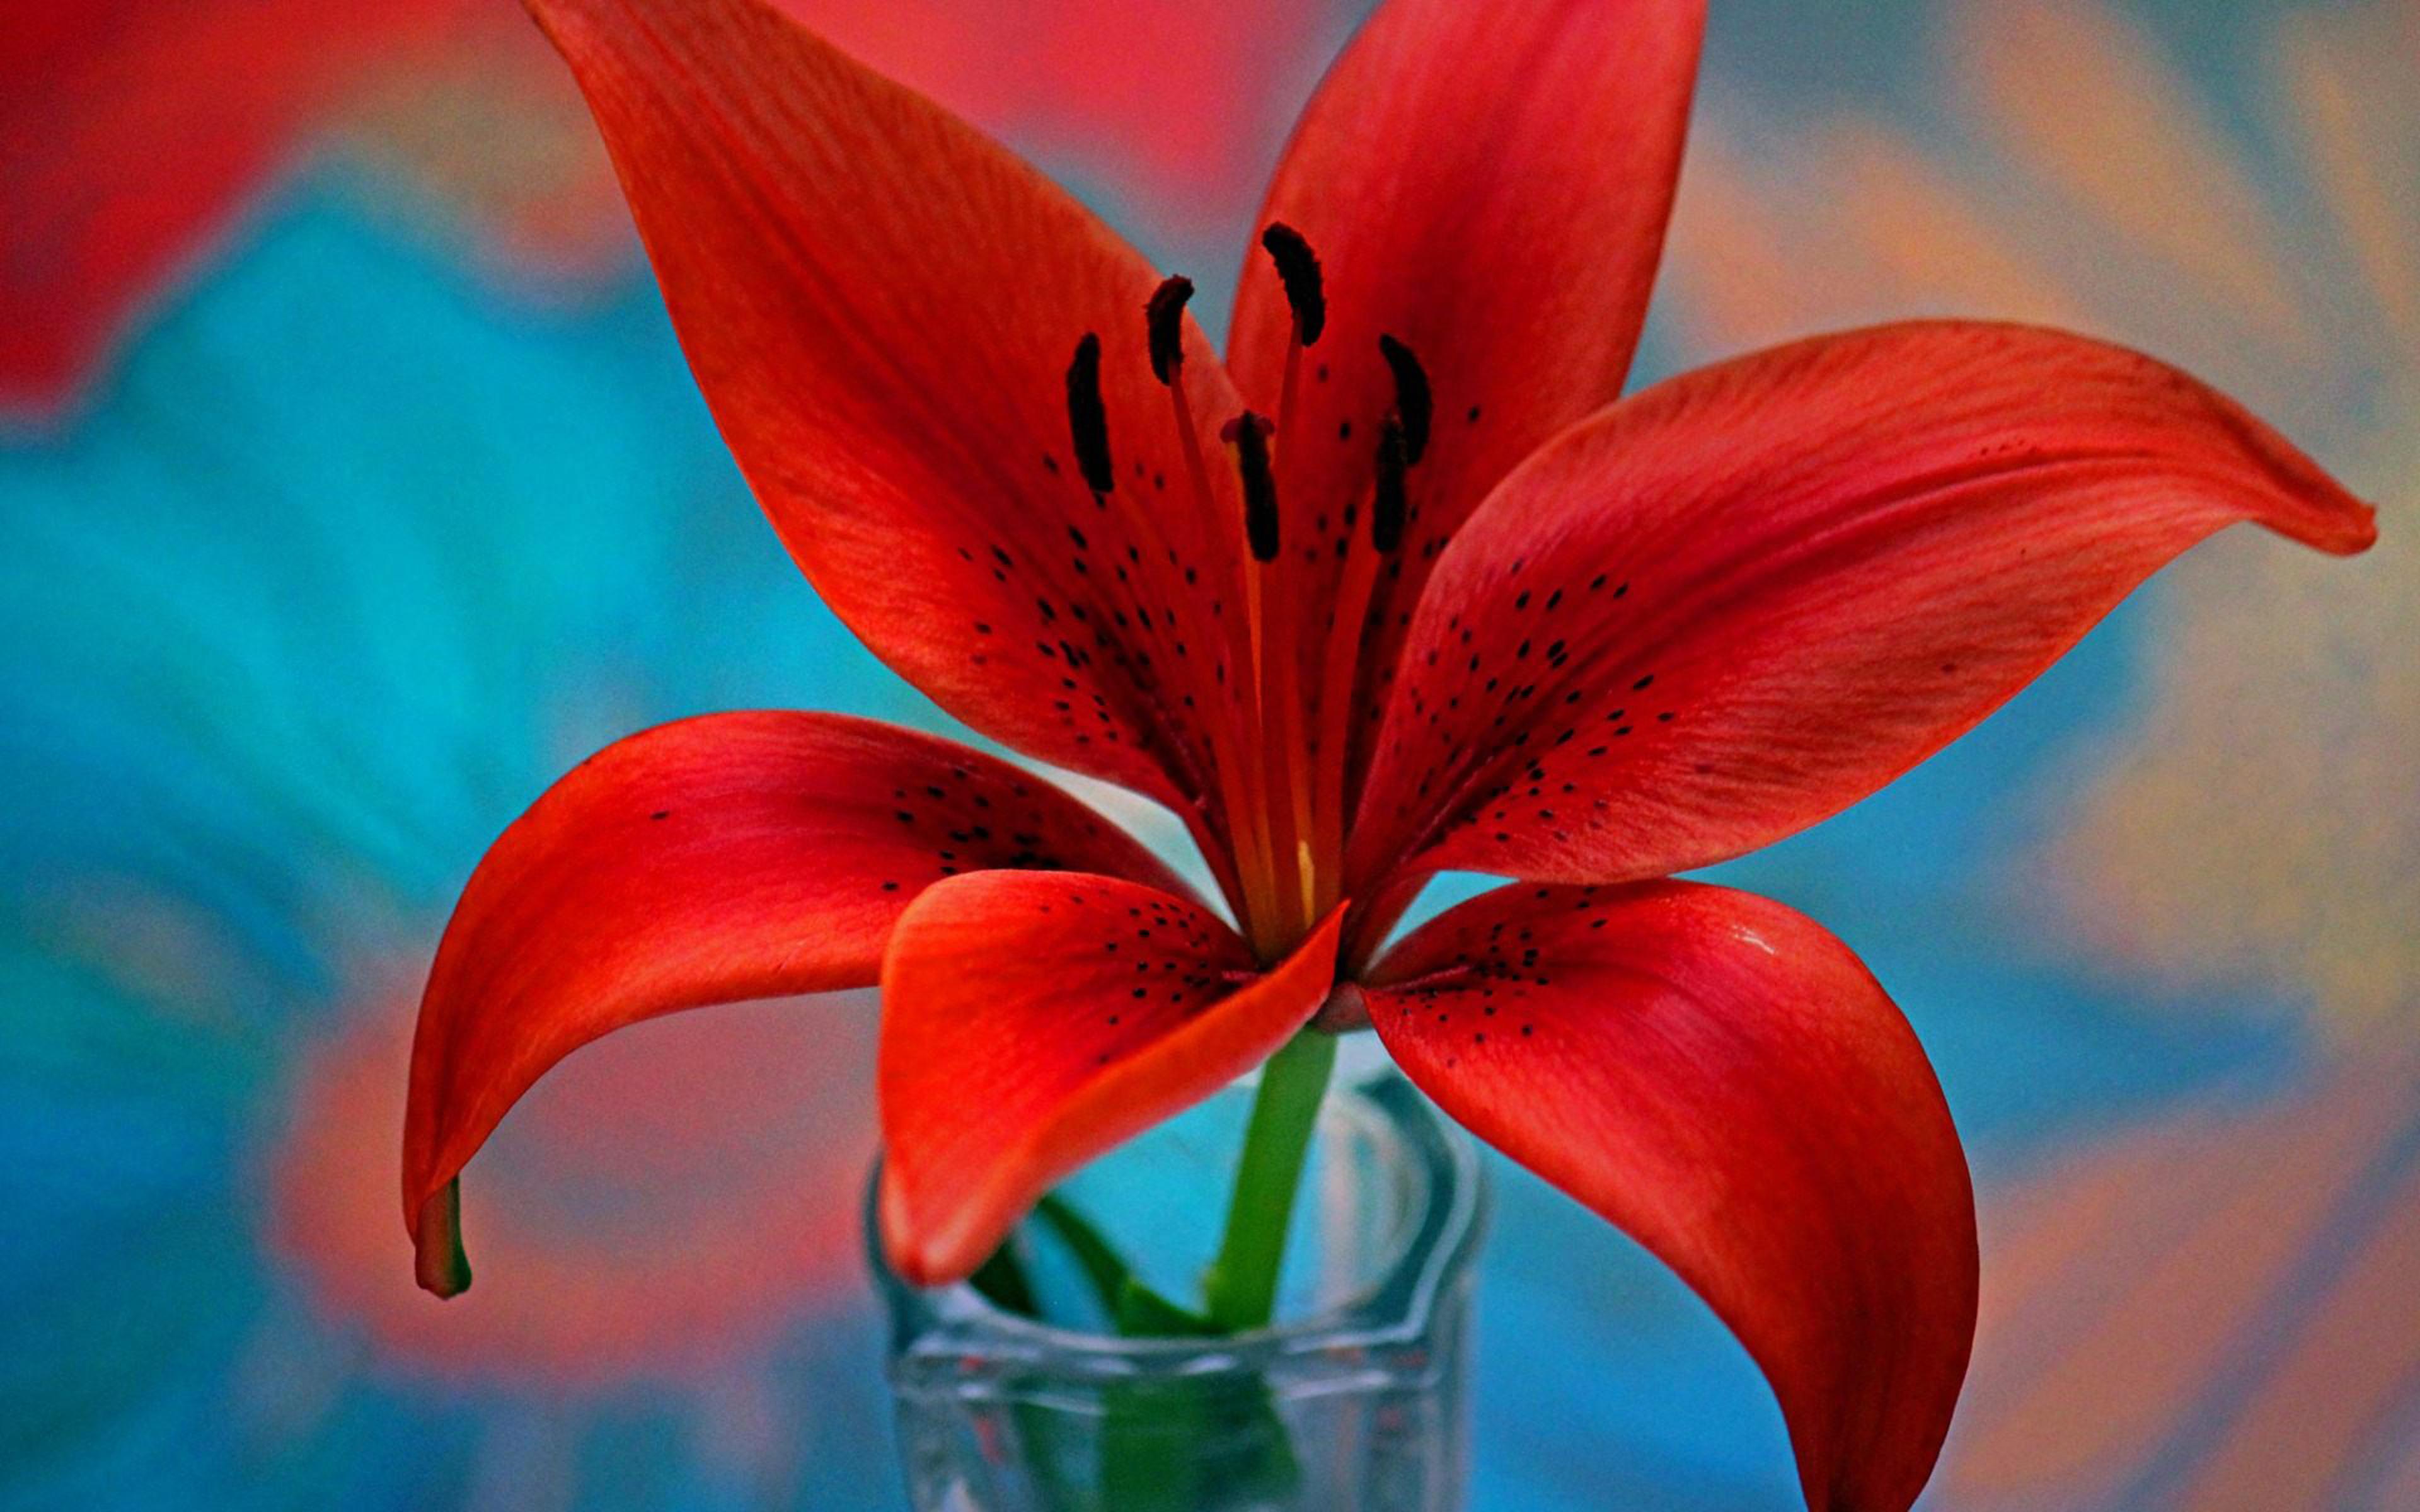 Red Lily Flower Wallpaper For Desktop Hd 3840x2400